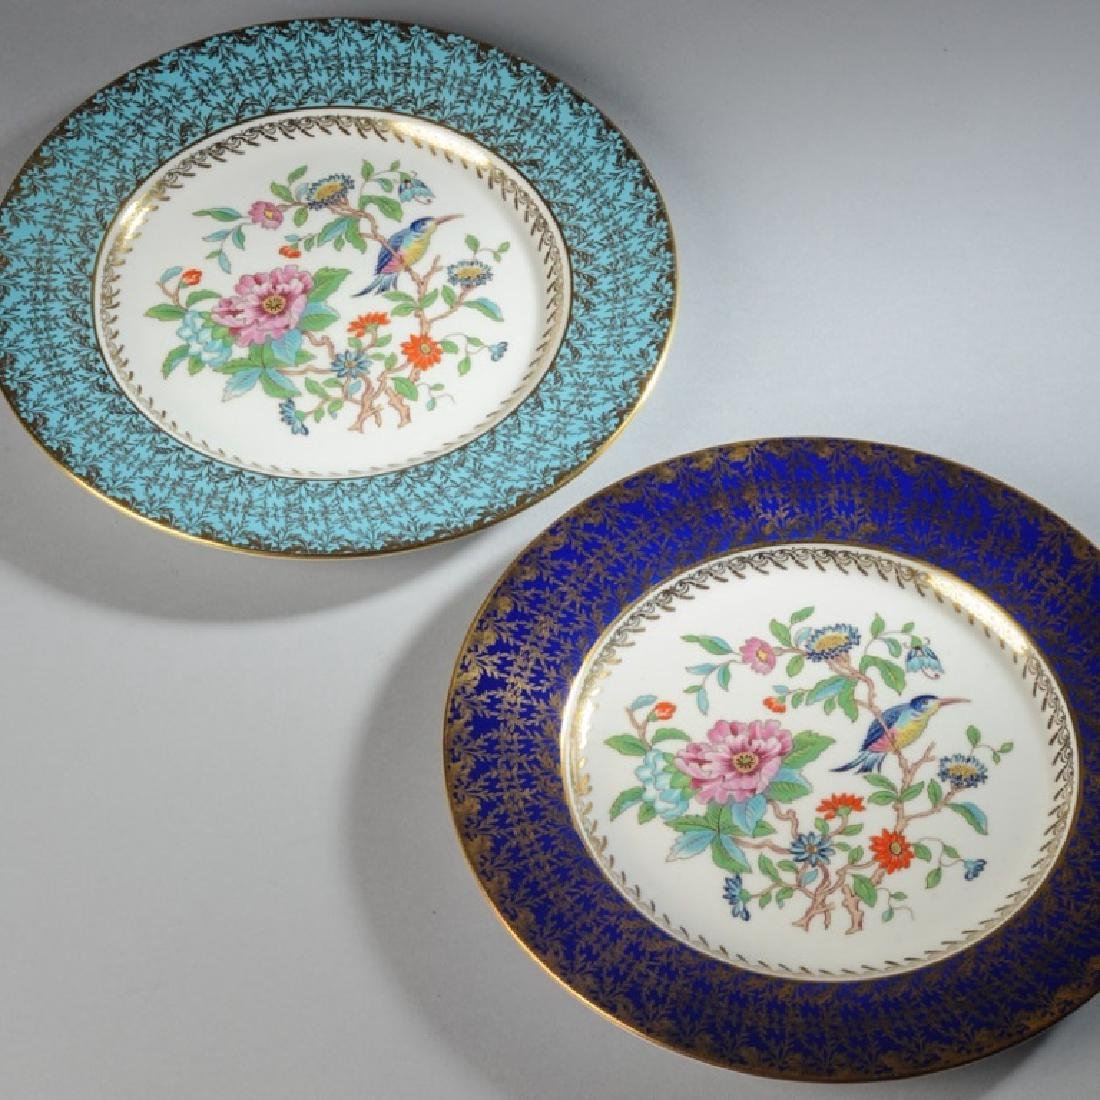 Two Aynsley Bone China Plates